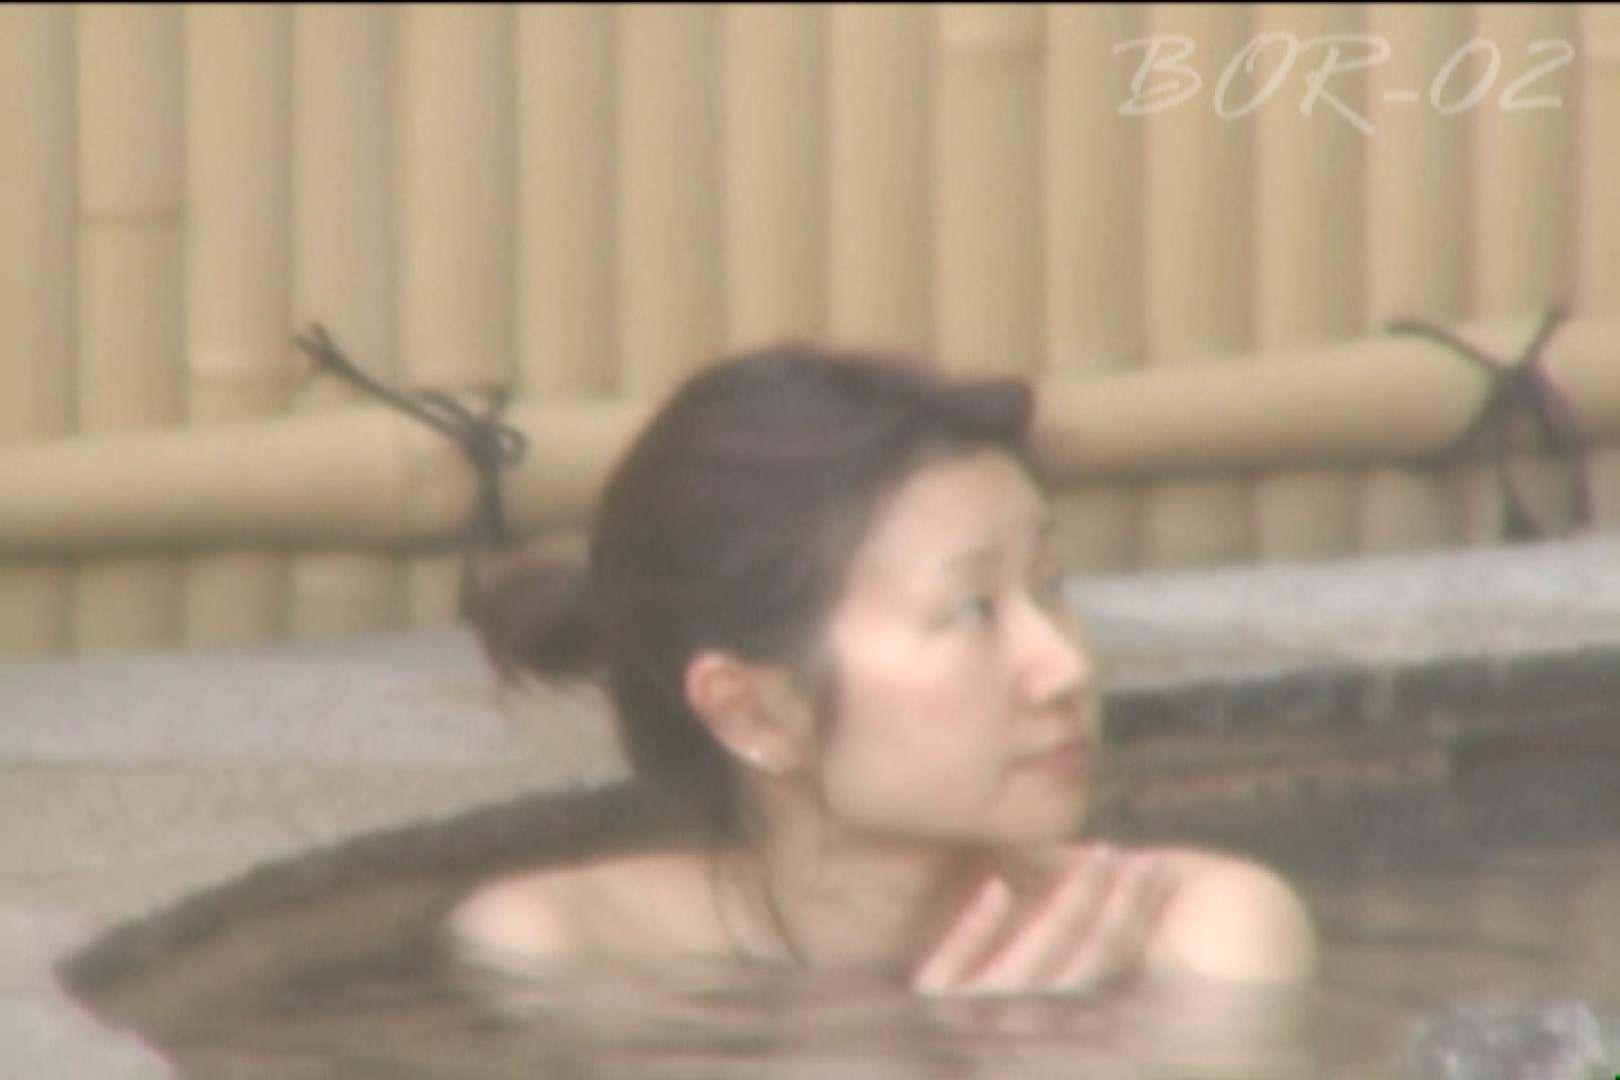 Aquaな露天風呂Vol.477 露天 アダルト動画キャプチャ 99PICs 14